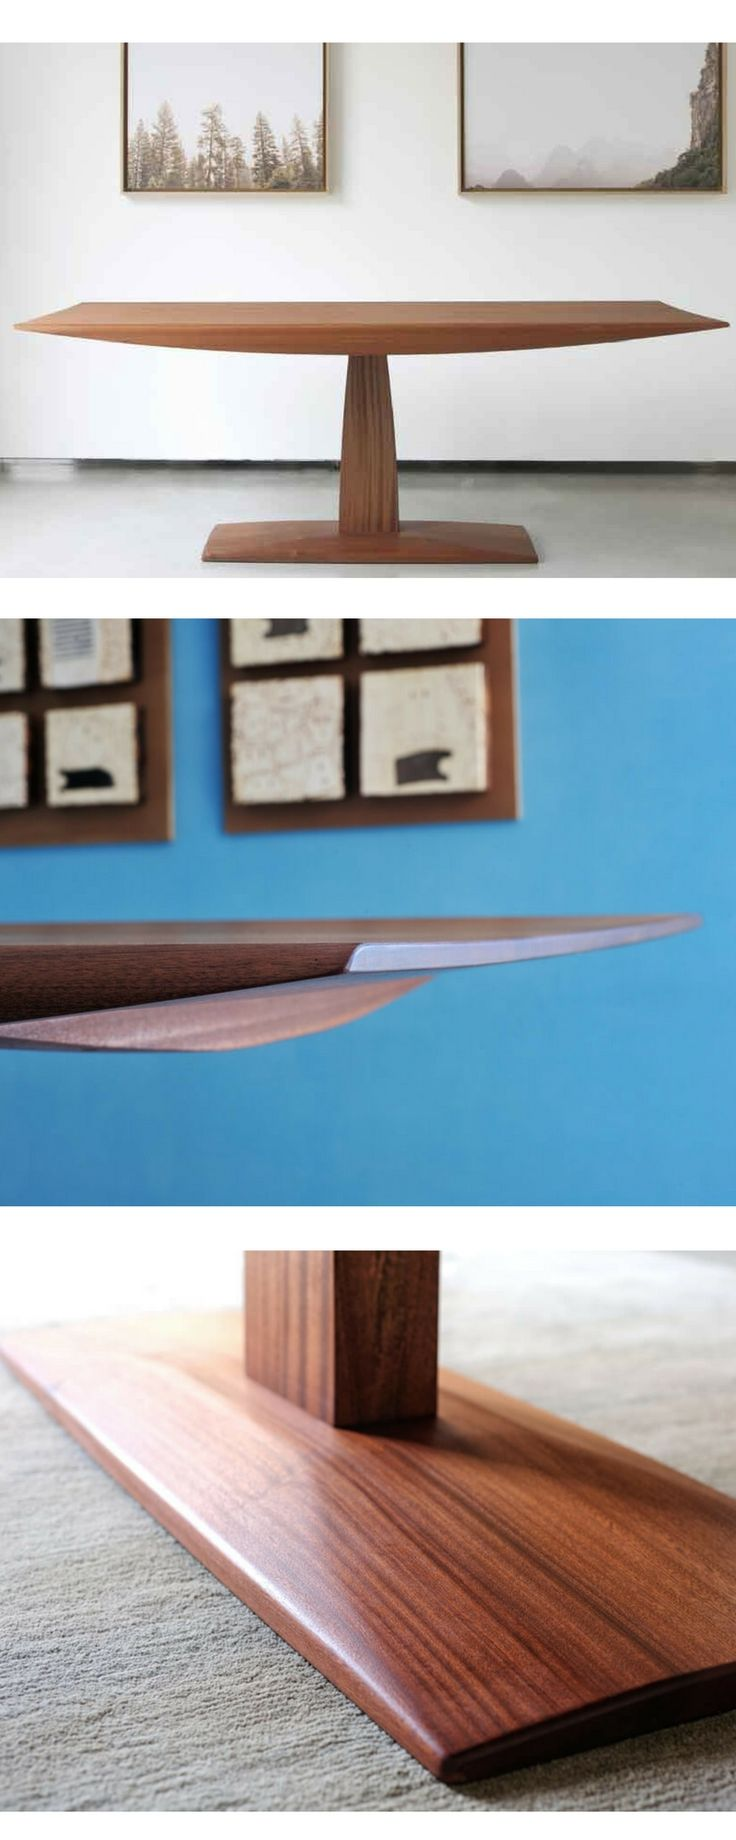 Table PI Greco Mahogany Wood by DIMA art& design . interior design wooden table